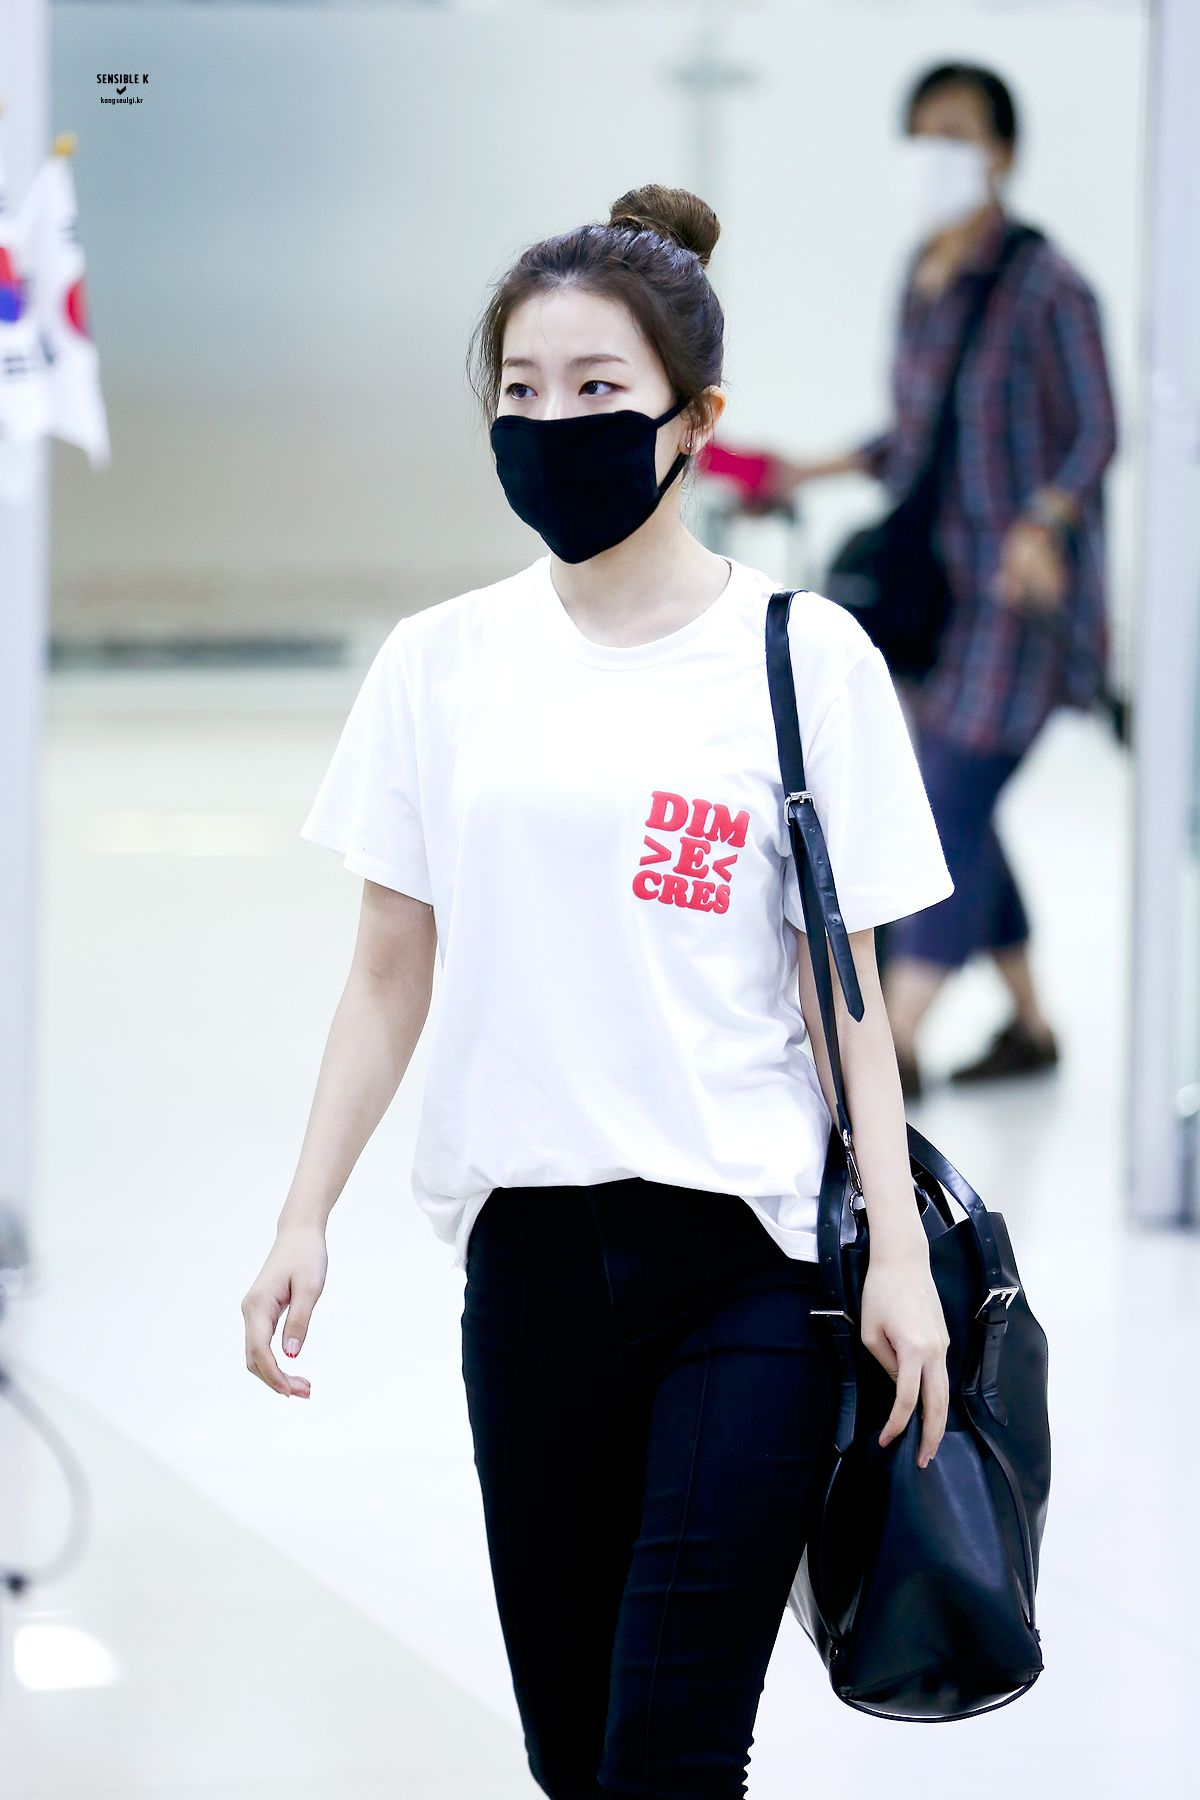 Seulgi Fashion Seulgi Airport Fashion Seulgi Airport 2016 Red Velvet Seulgi 2016 Seulgi Outfits Kpop Idol Airport Fashion Seulgi Dance Seulgi Fashion Inf